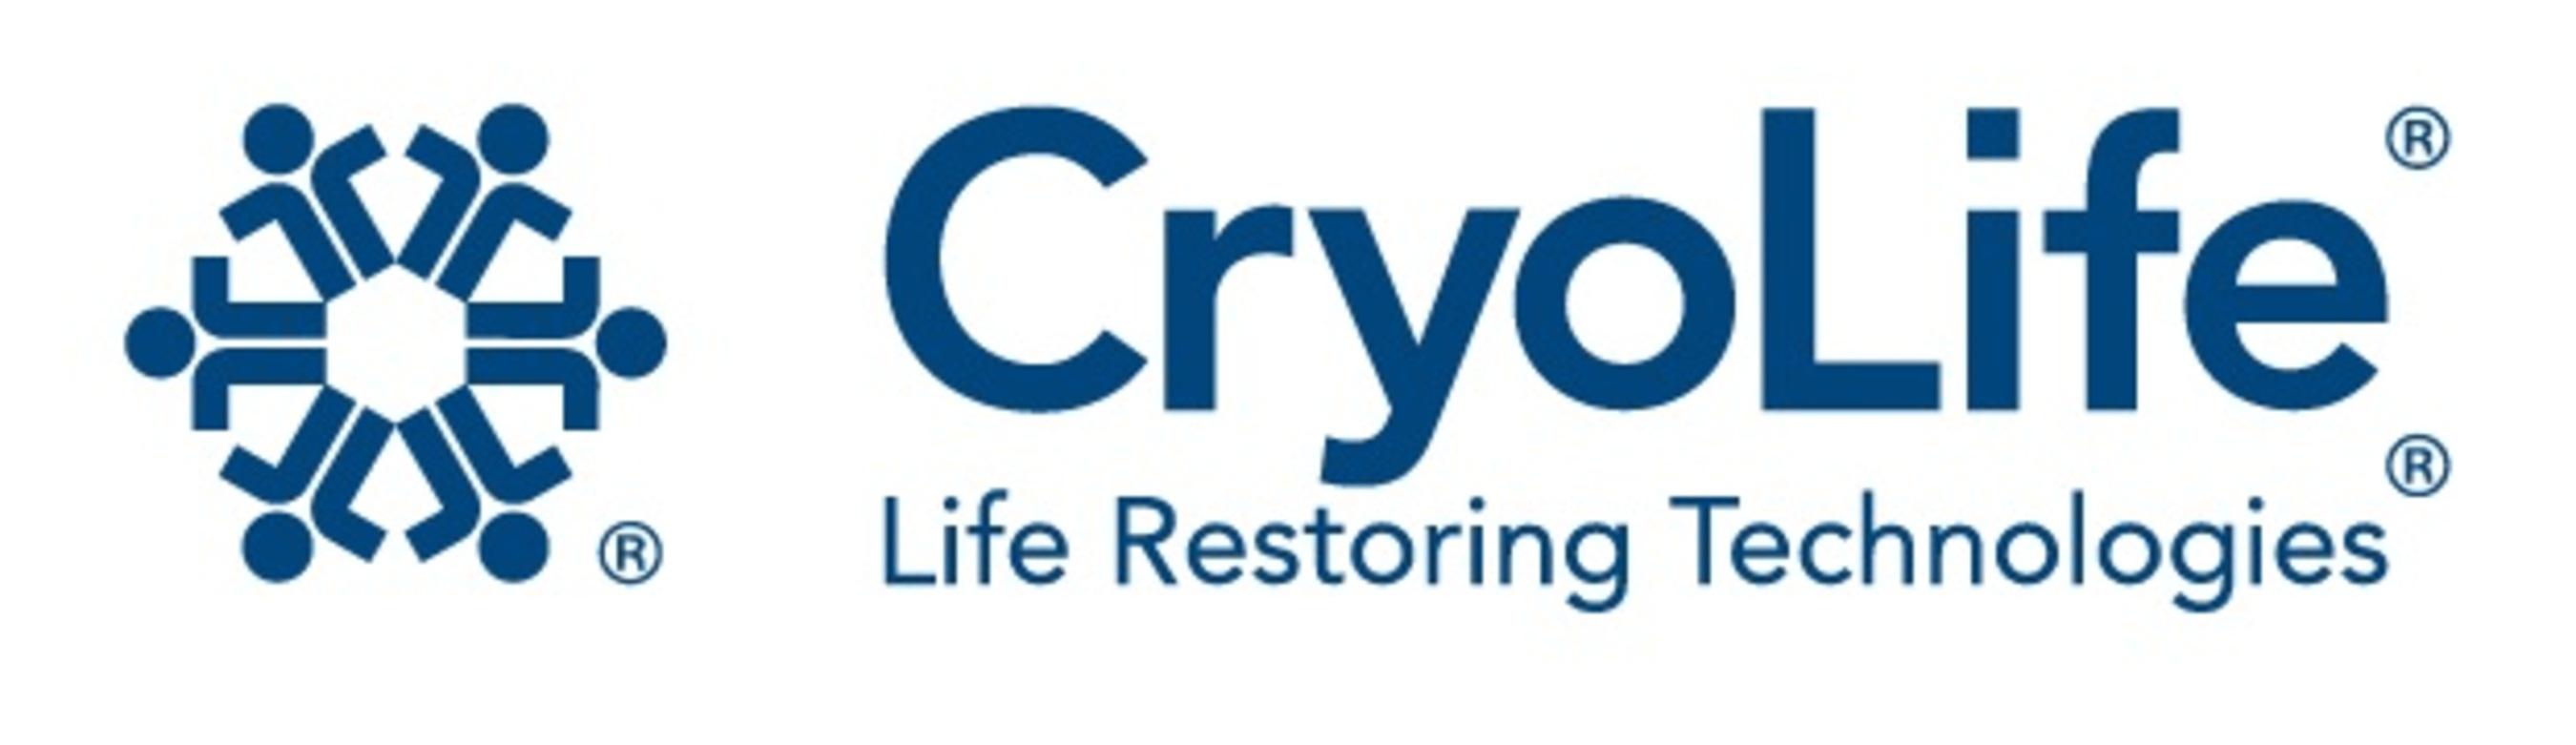 Cryolife logo. (PRNewsFoto/CryoLife, Inc.) (PRNewsFoto/CRYOLIFE_ INC_)